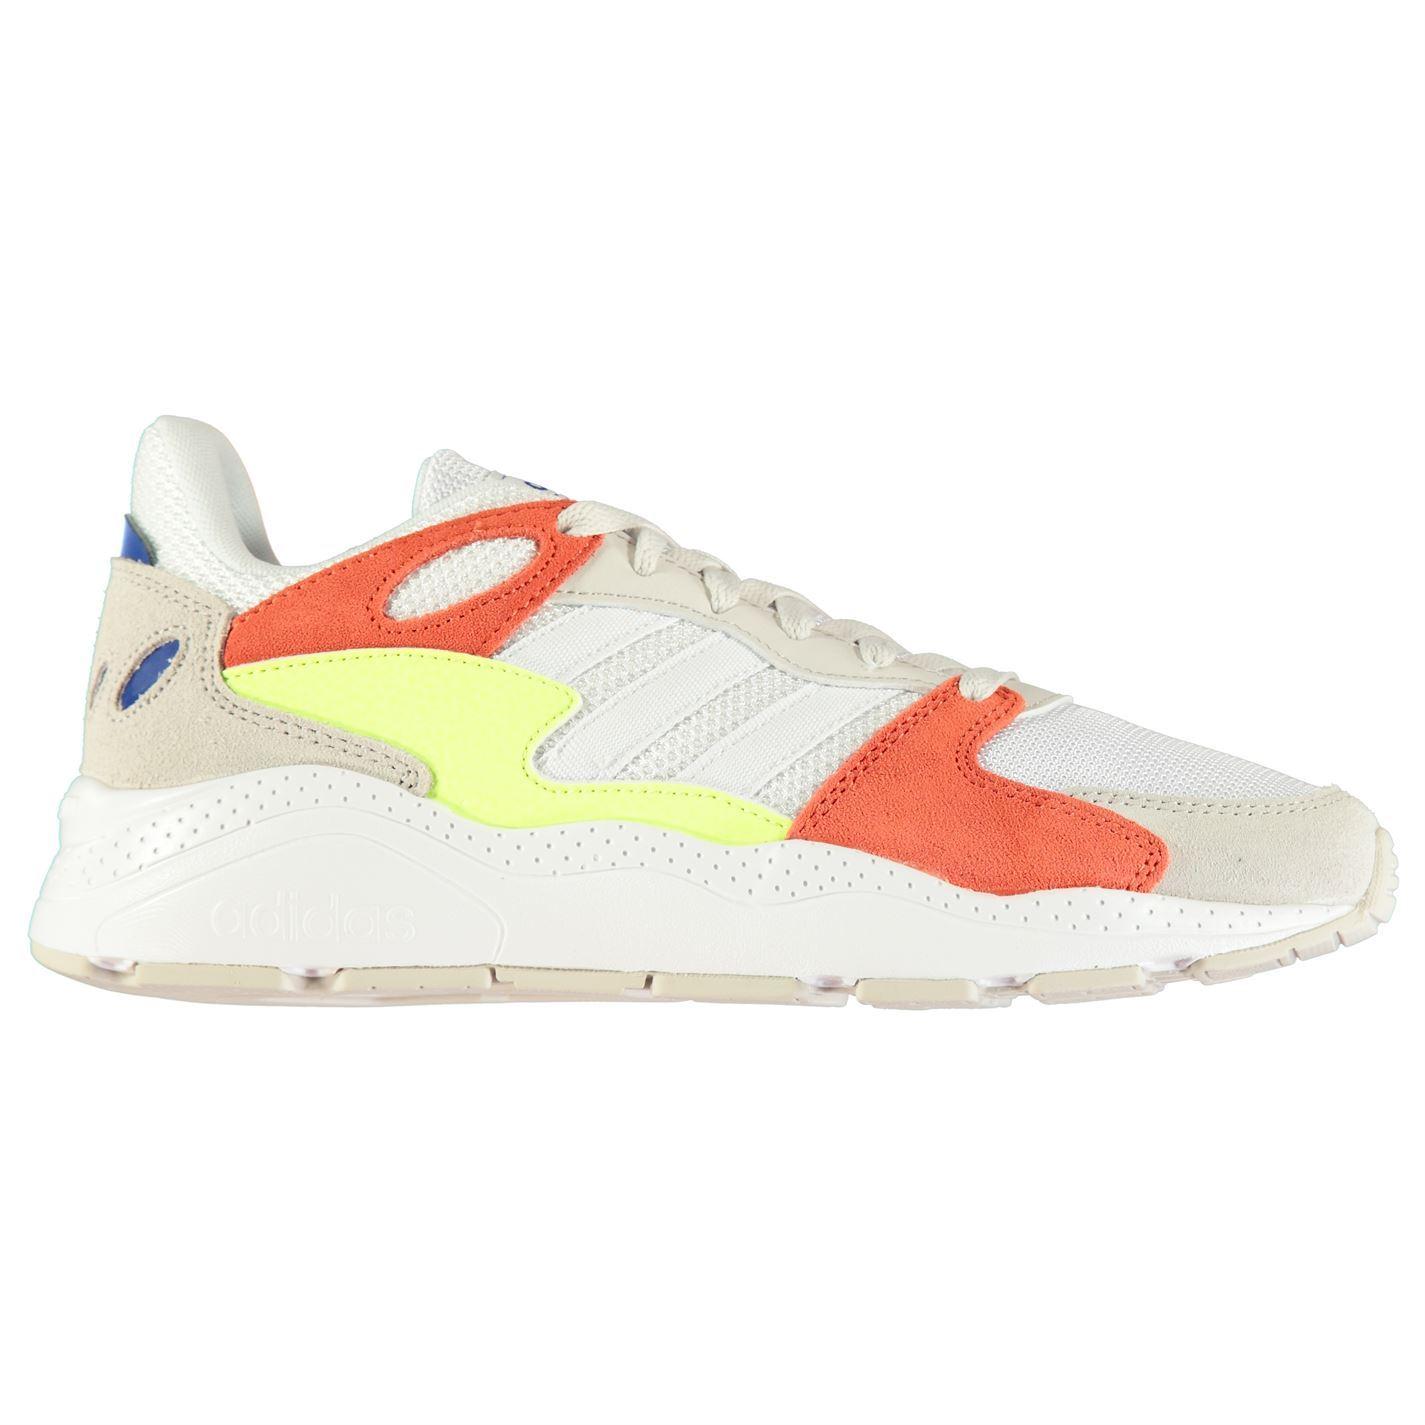 Adidas-Crazychaos-Baskets-Homme-Chaussures-De-Loisirs-Chaussures-Baskets miniature 28